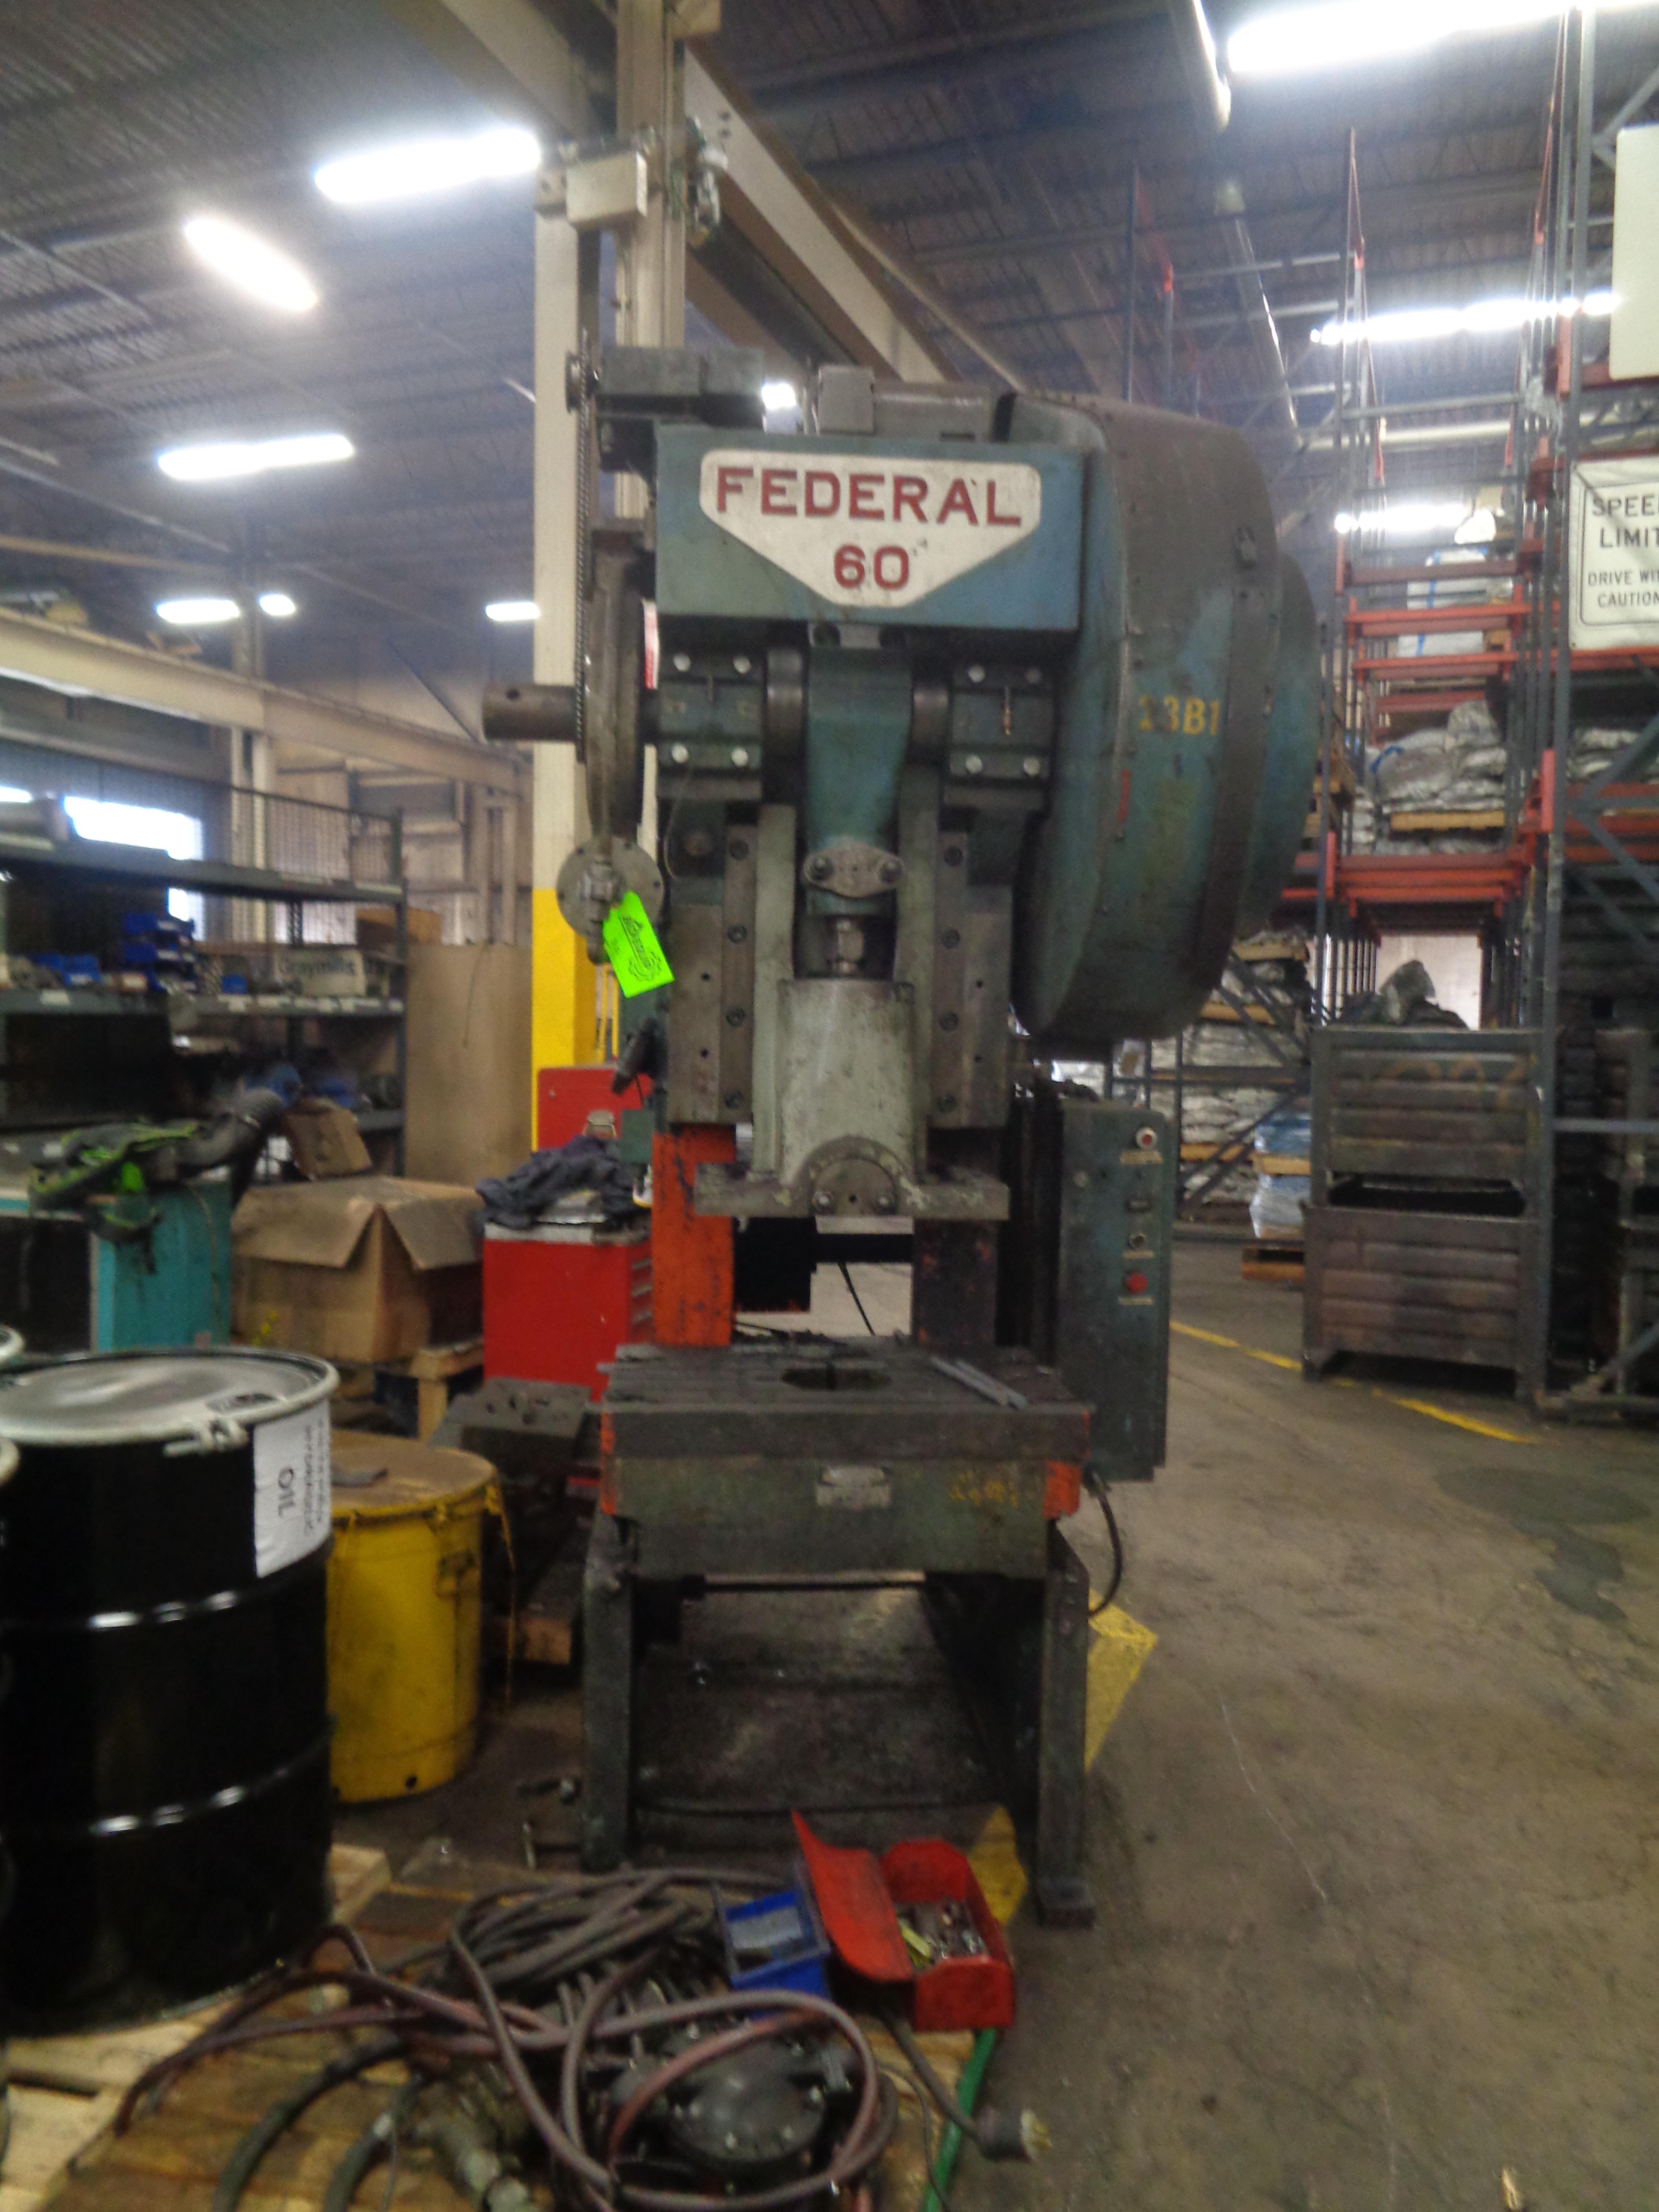 Federal Press 60 Ton - Located in Swedsboro NJ - Image 6 of 7